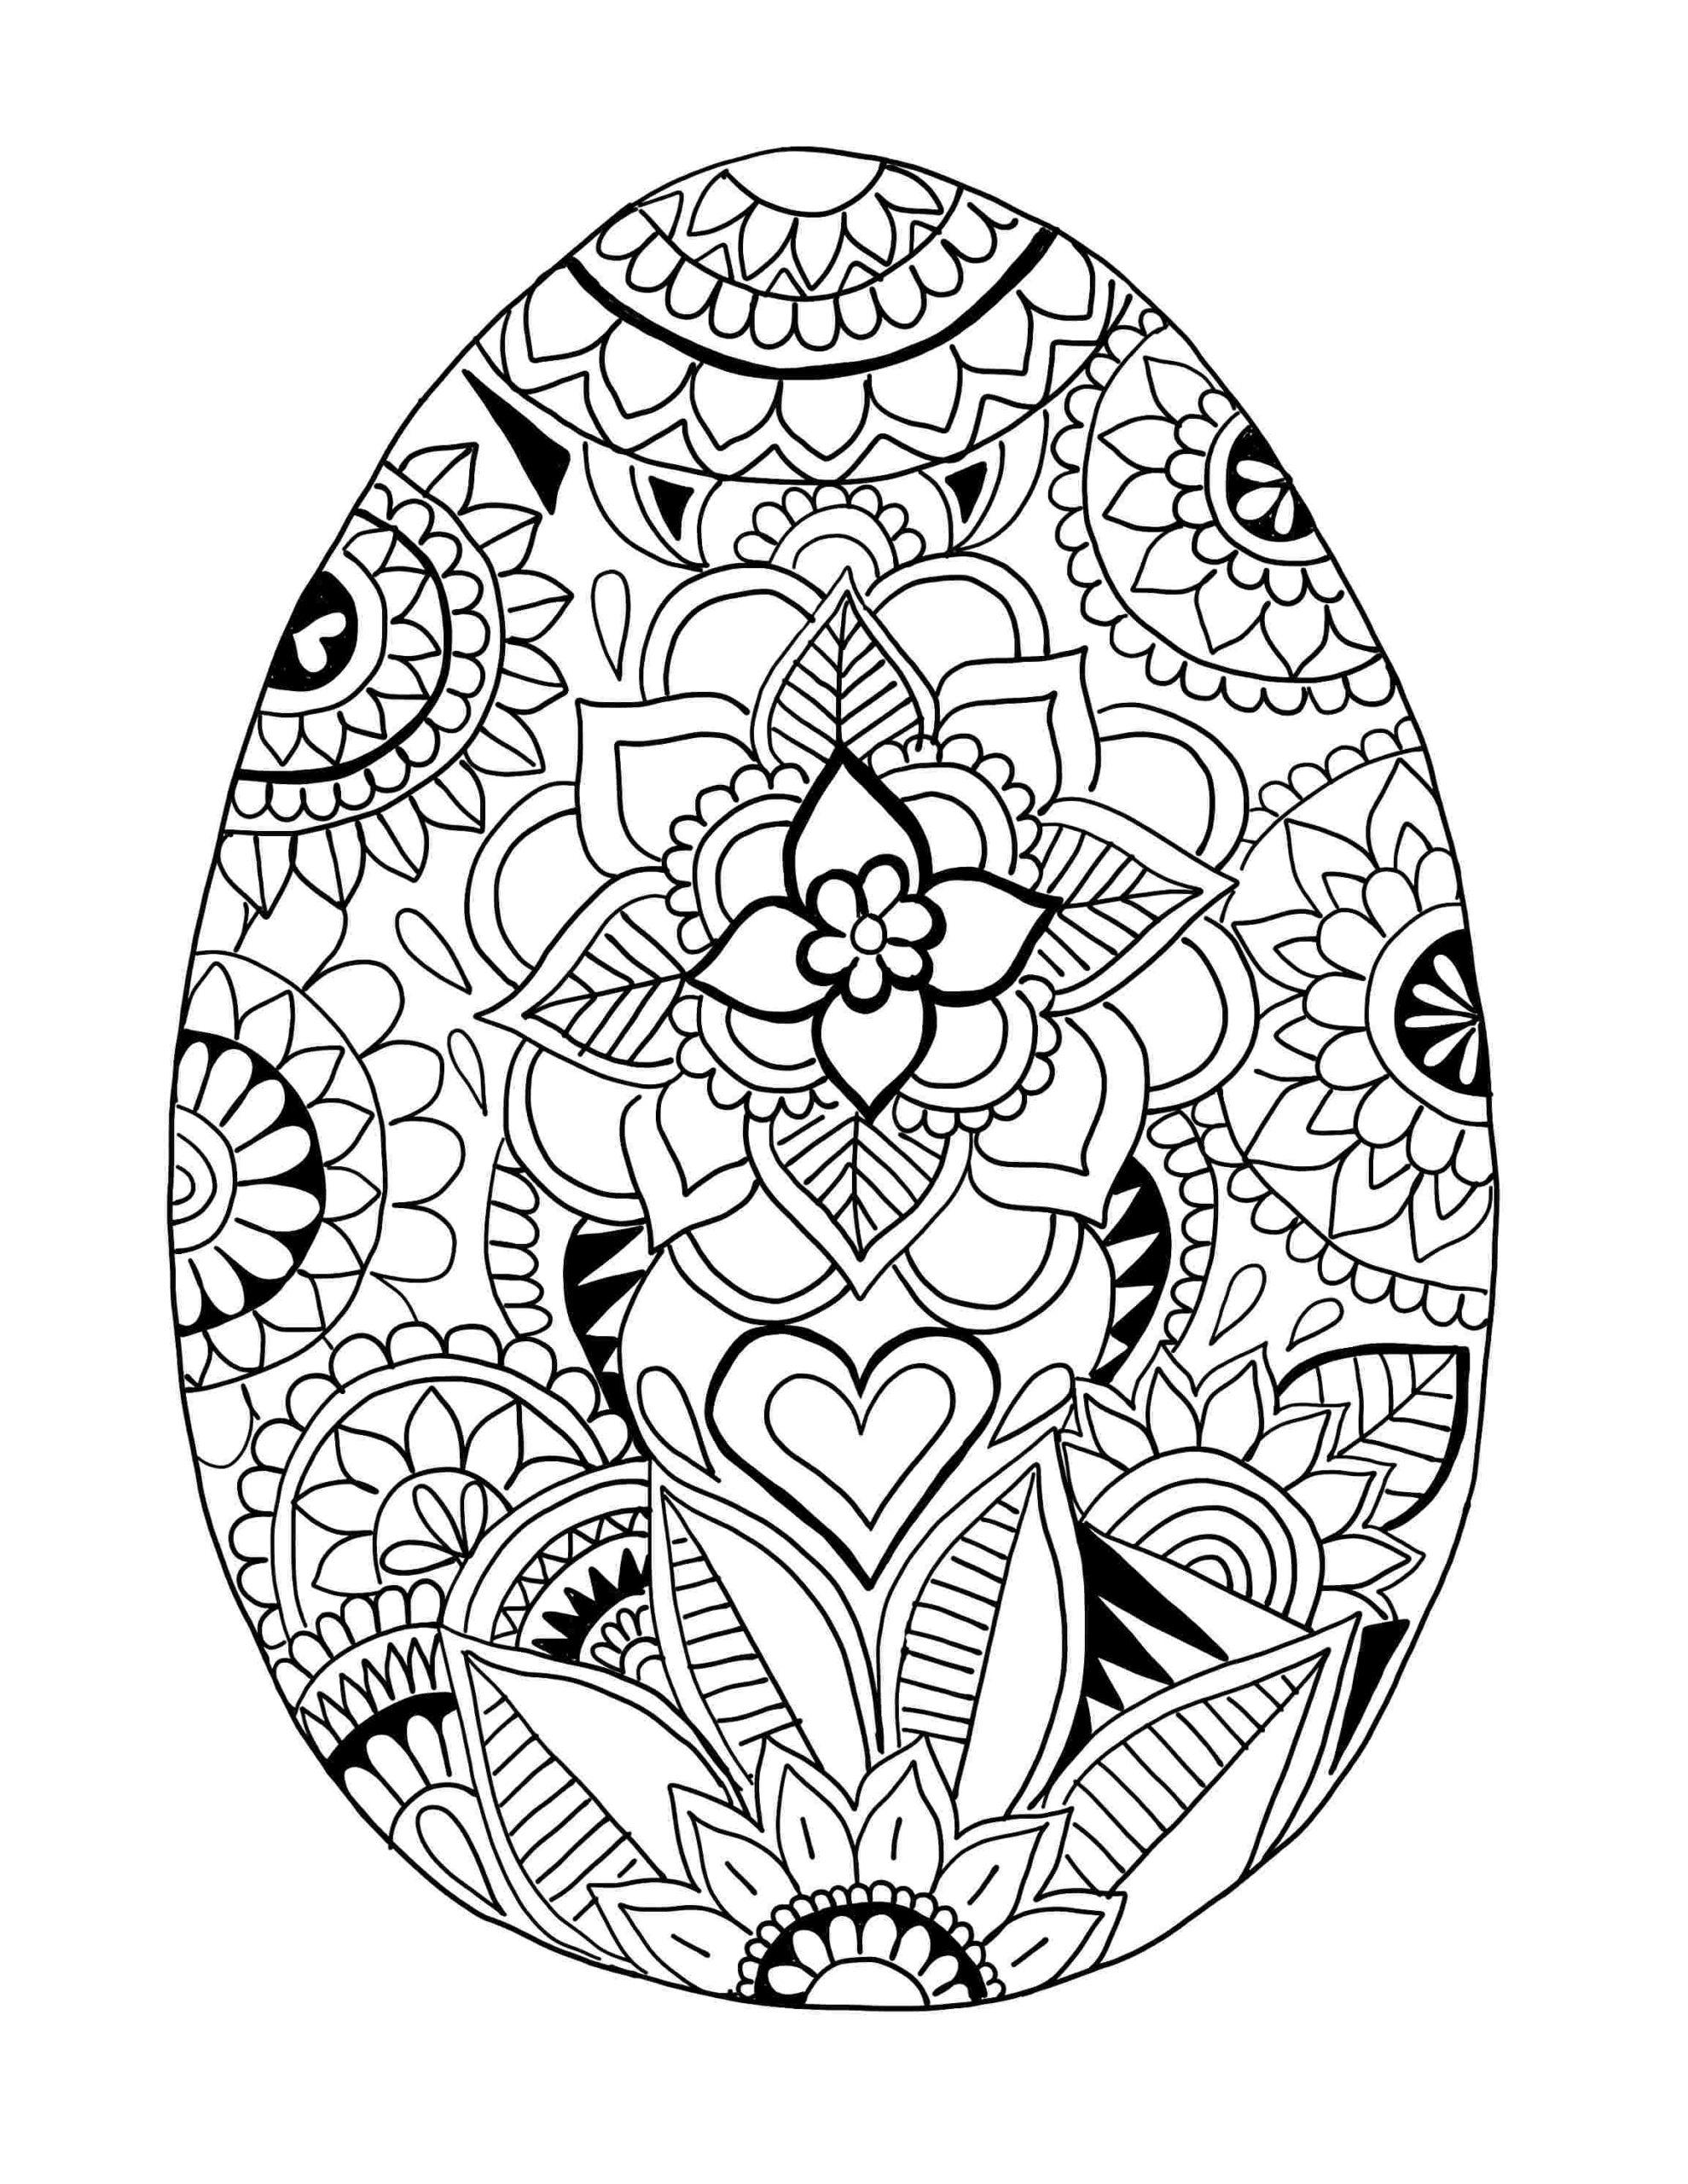 Coloring Pages : Printable Easter Mandala Coloring Free tout Mandala Fée